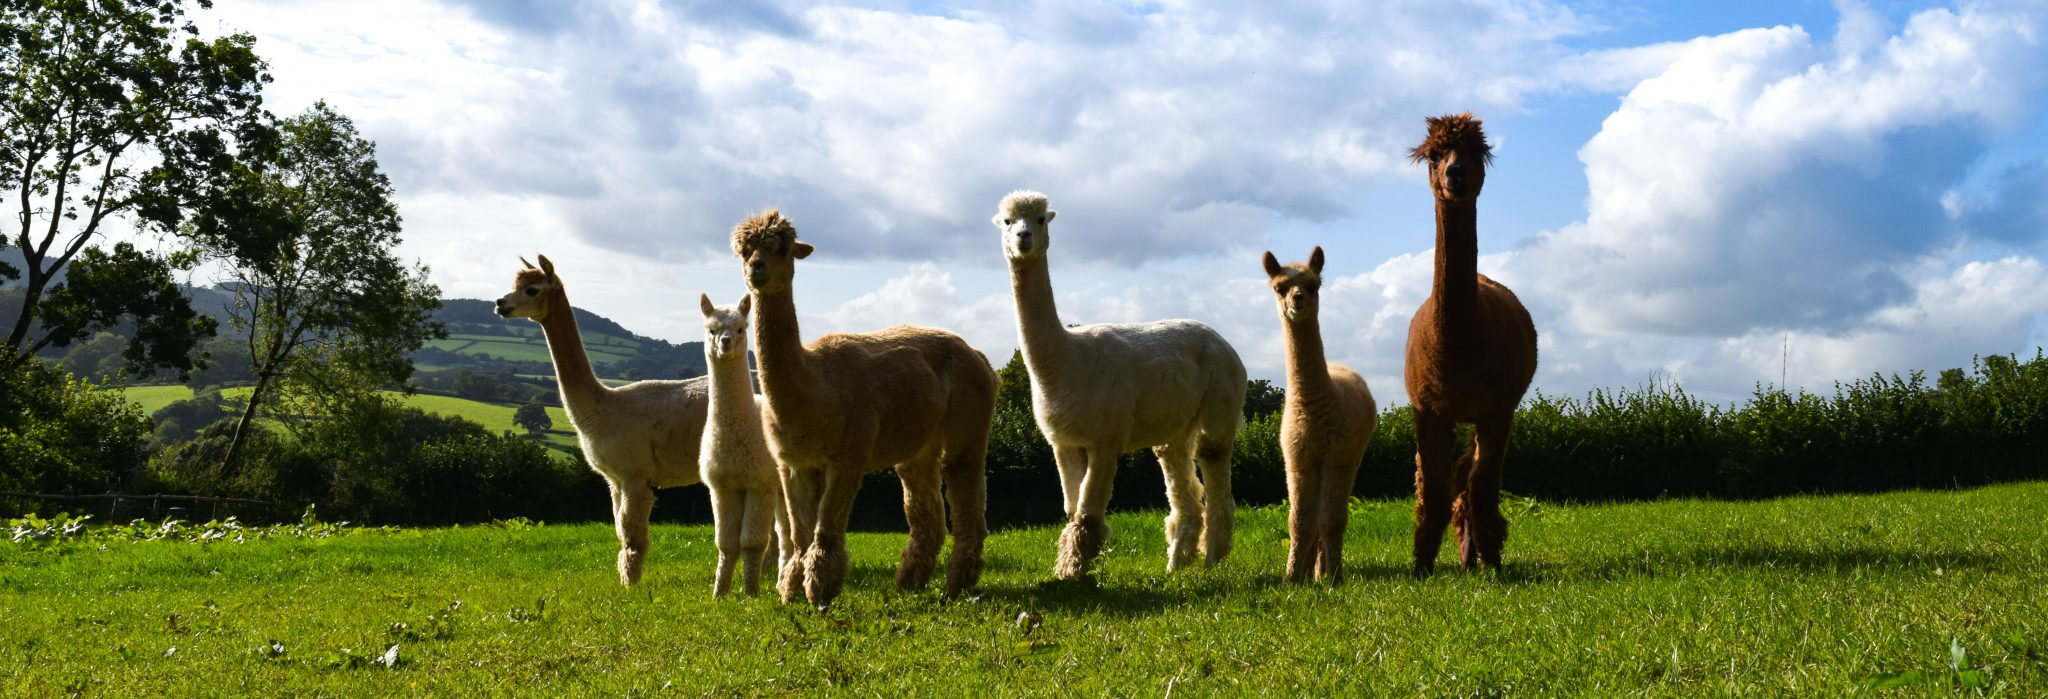 Six alpacas standing in the Little Orchard field